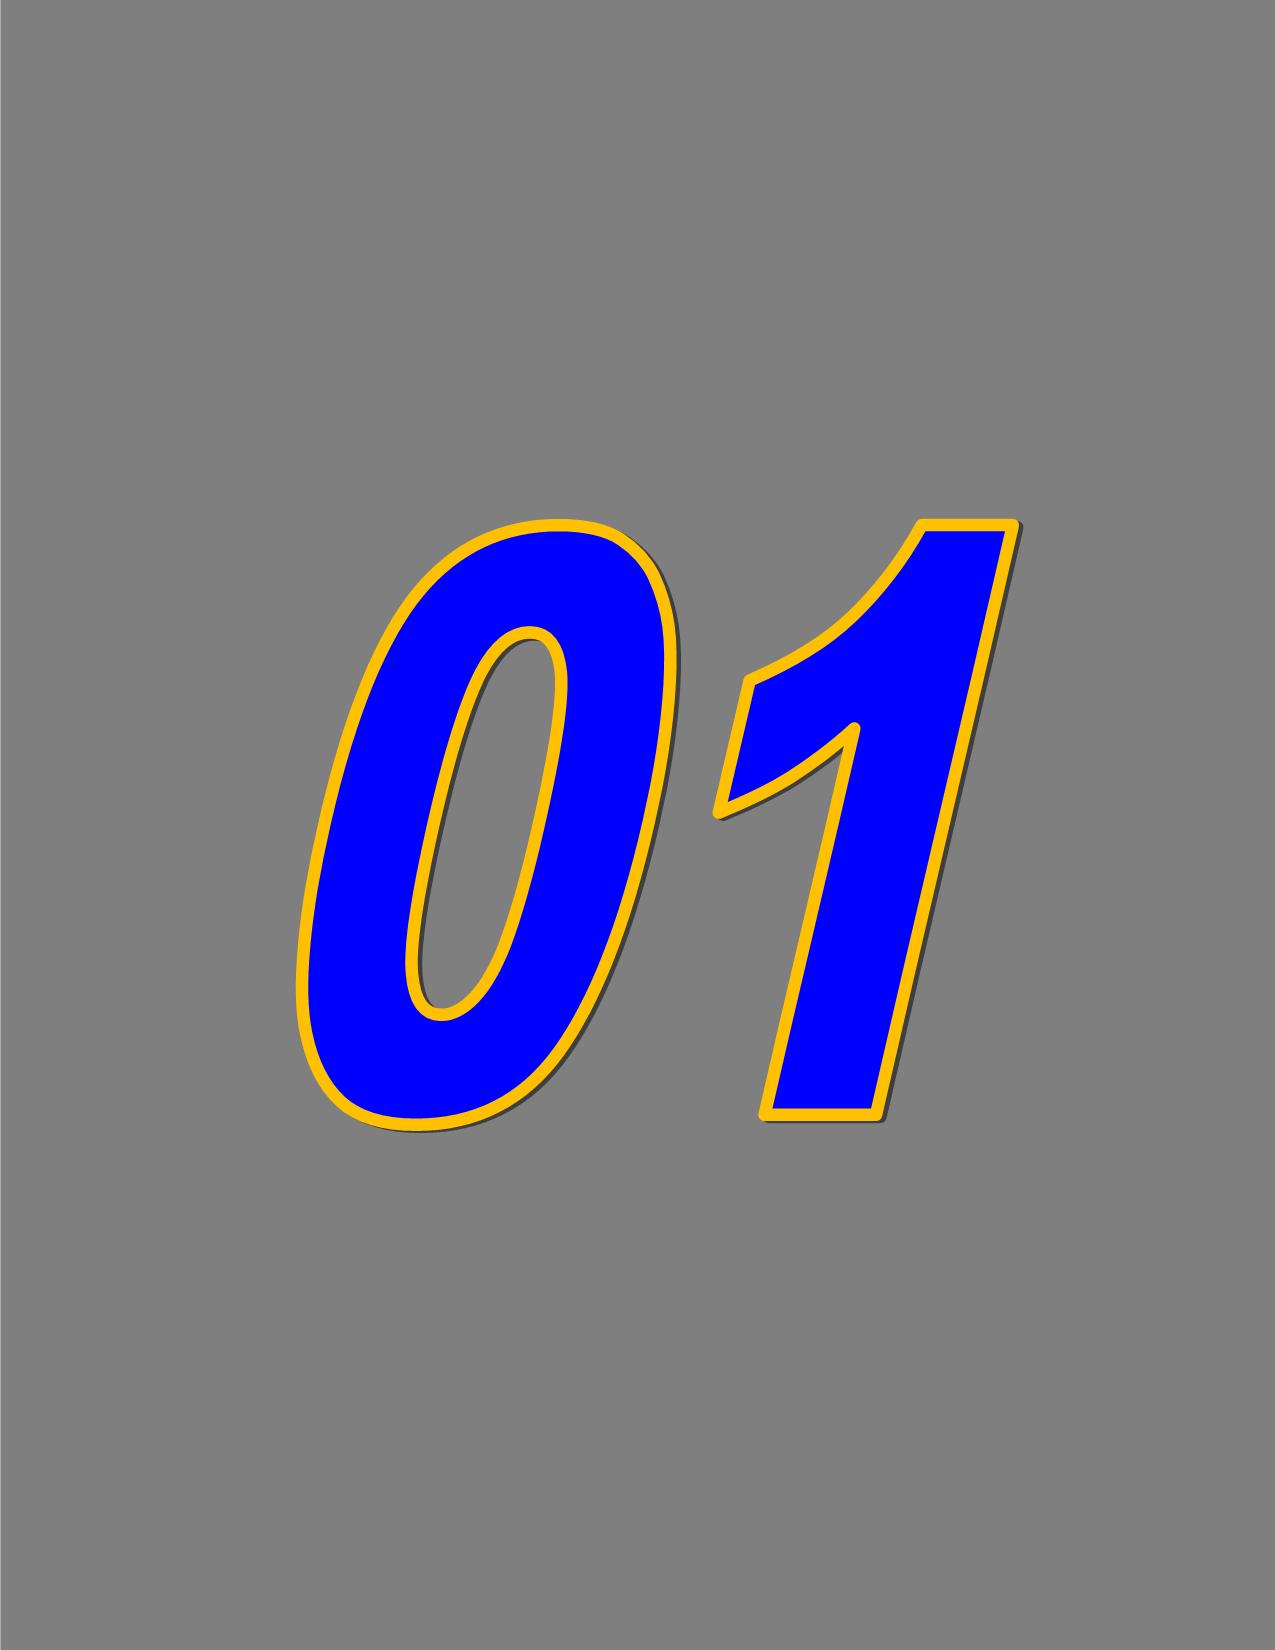 Number 01